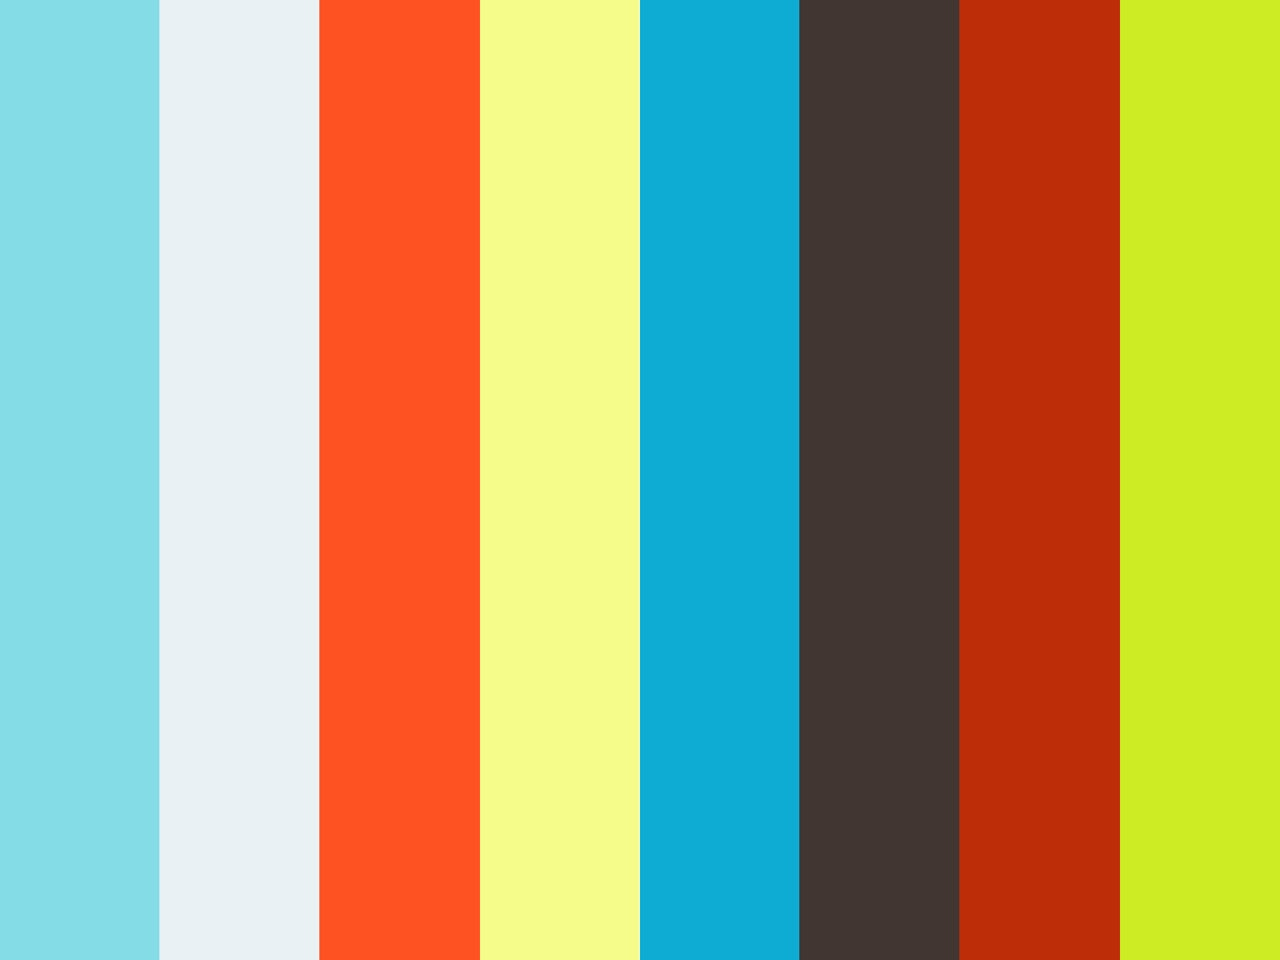 Tahiti via my Google Pixel 2 phone